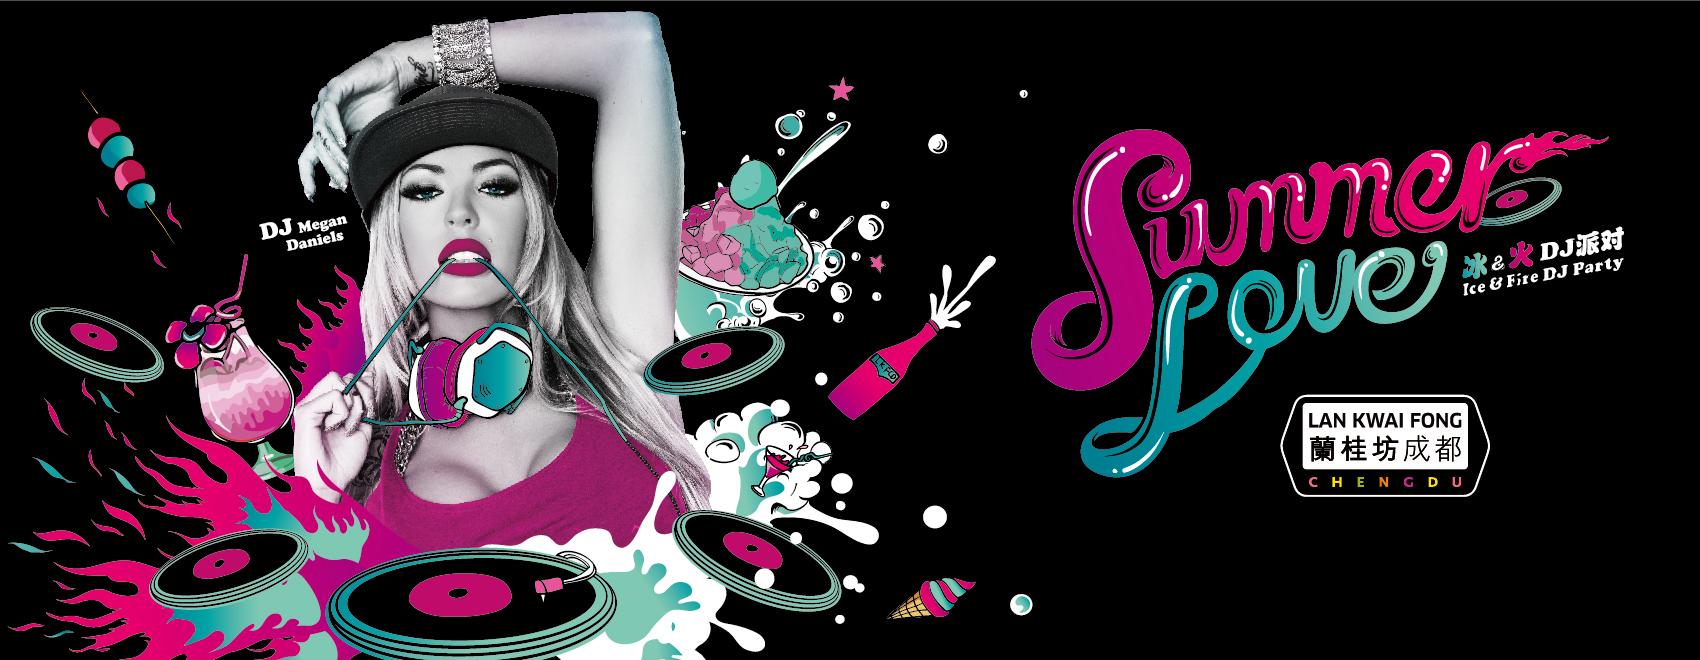 SL-Web-banner-01